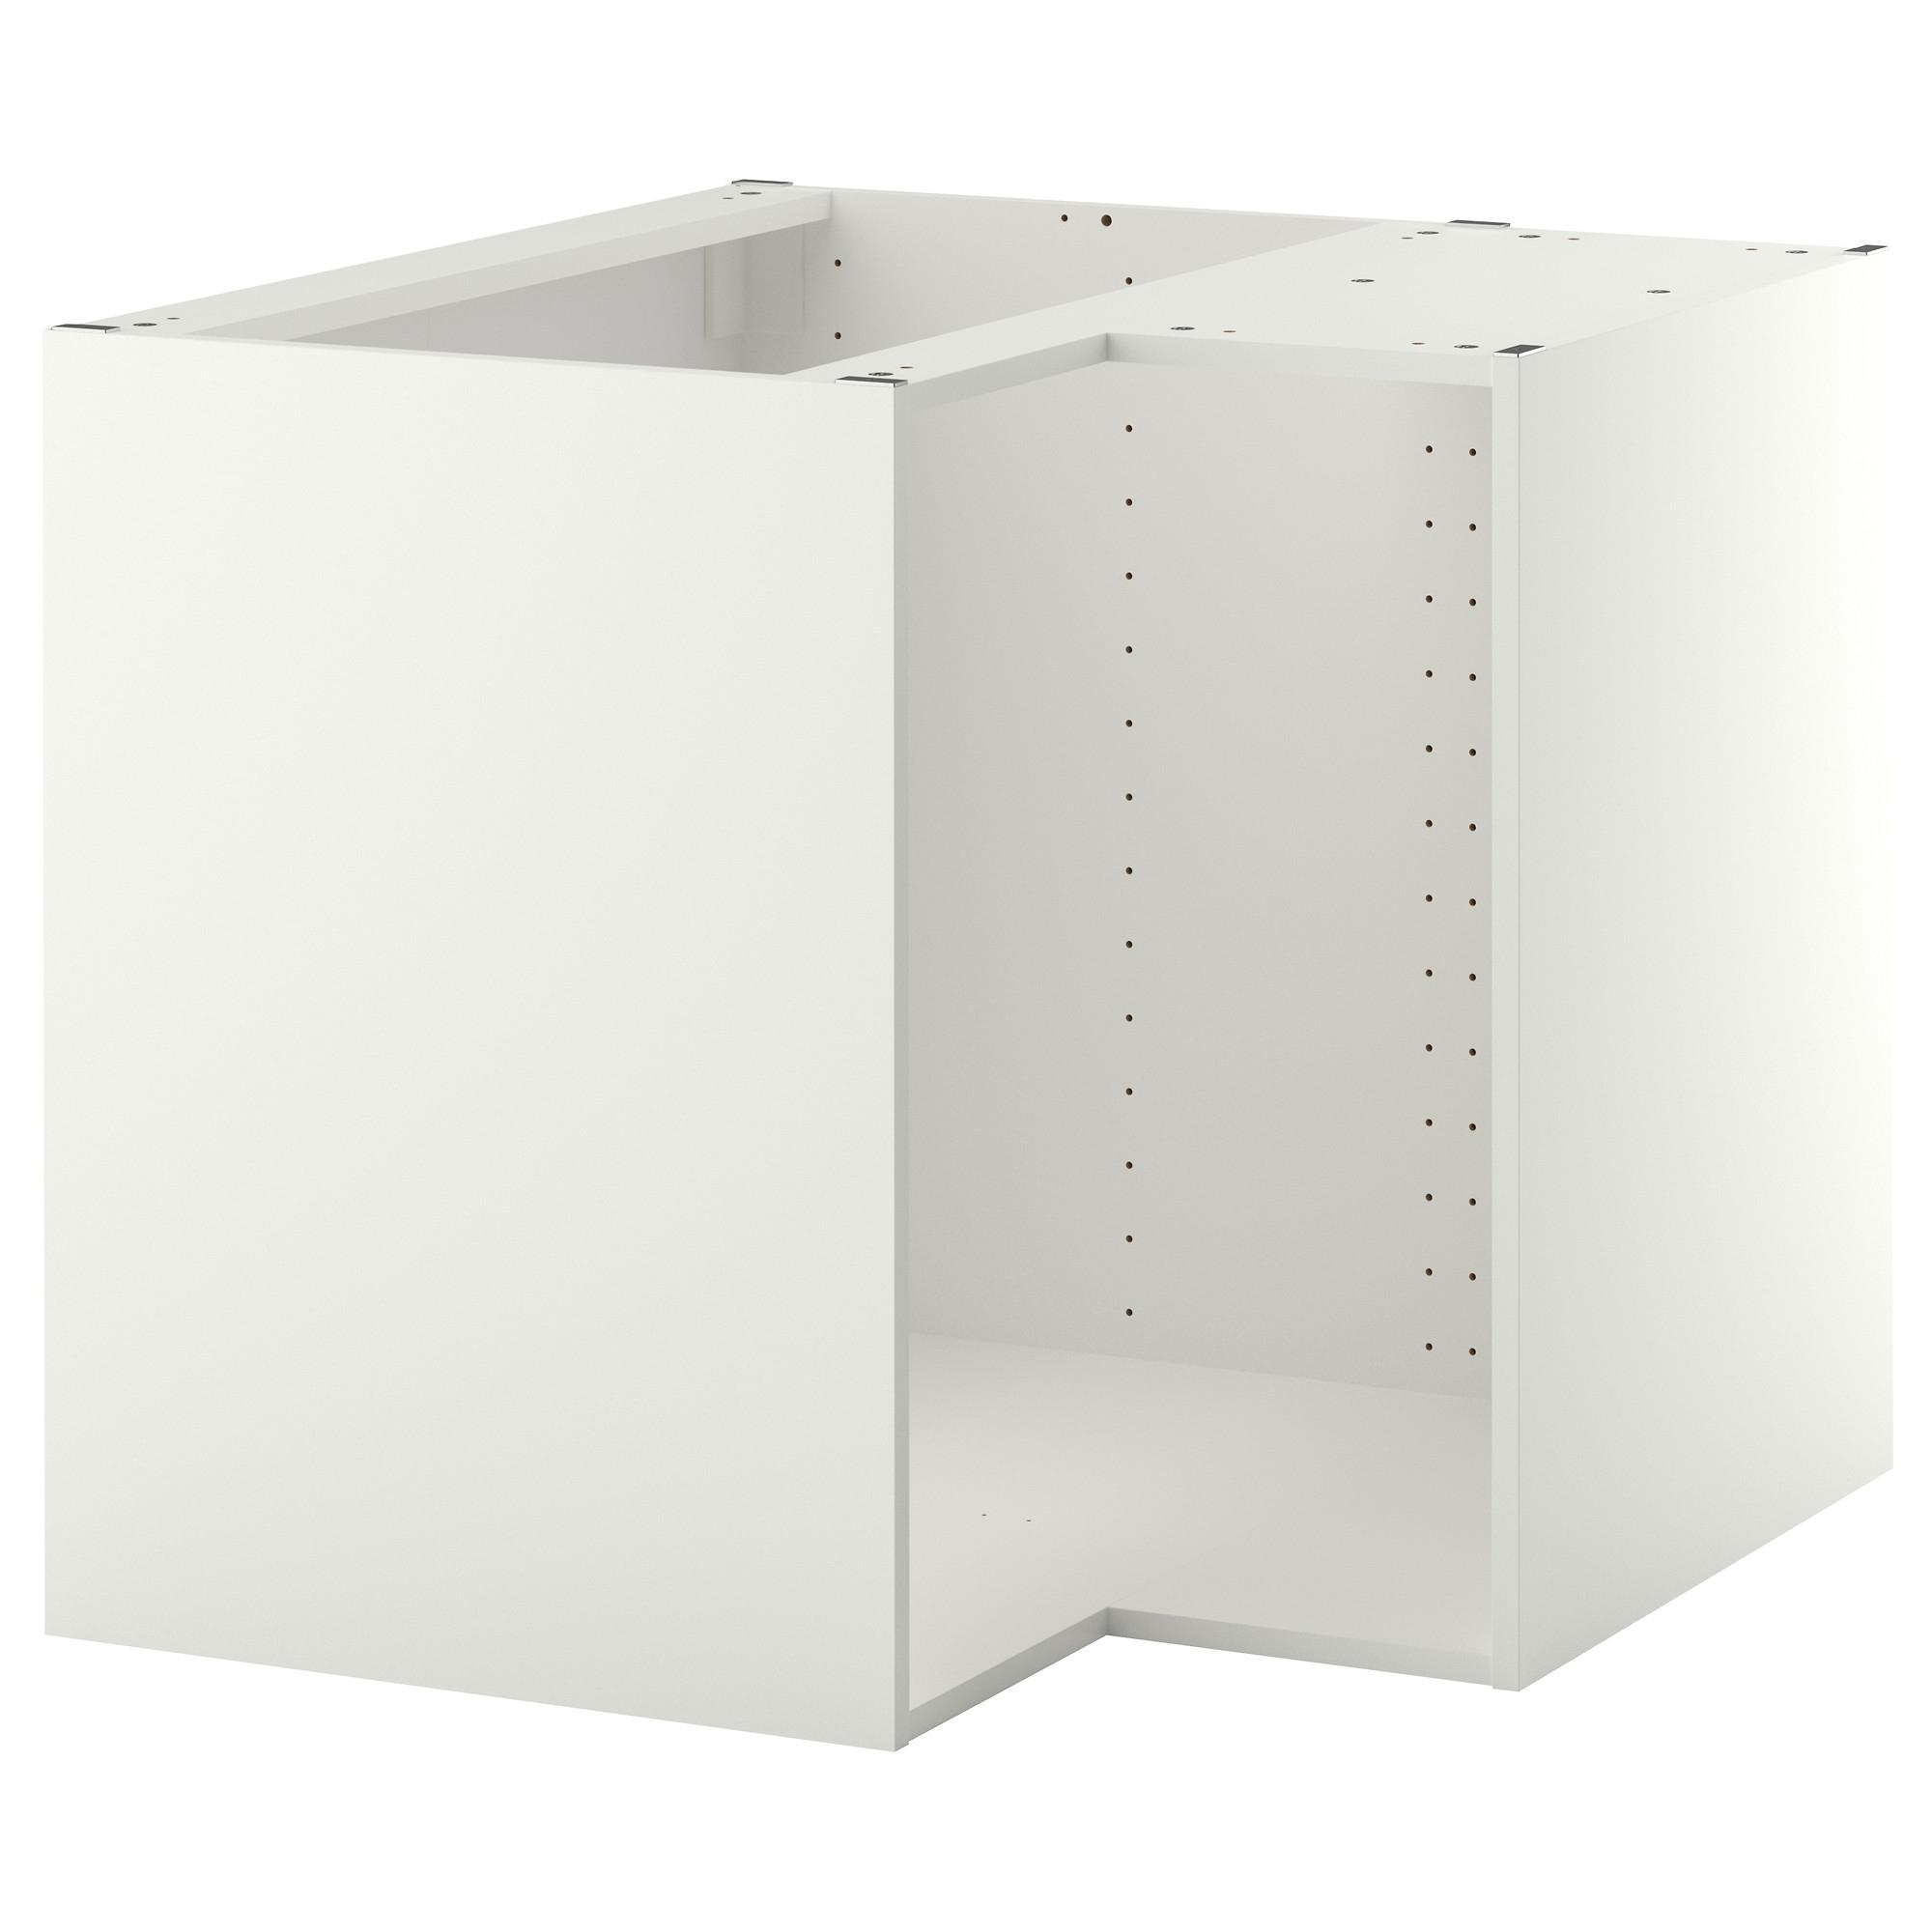 Metod estructura armario base esquina - Armarios de esquina ikea ...